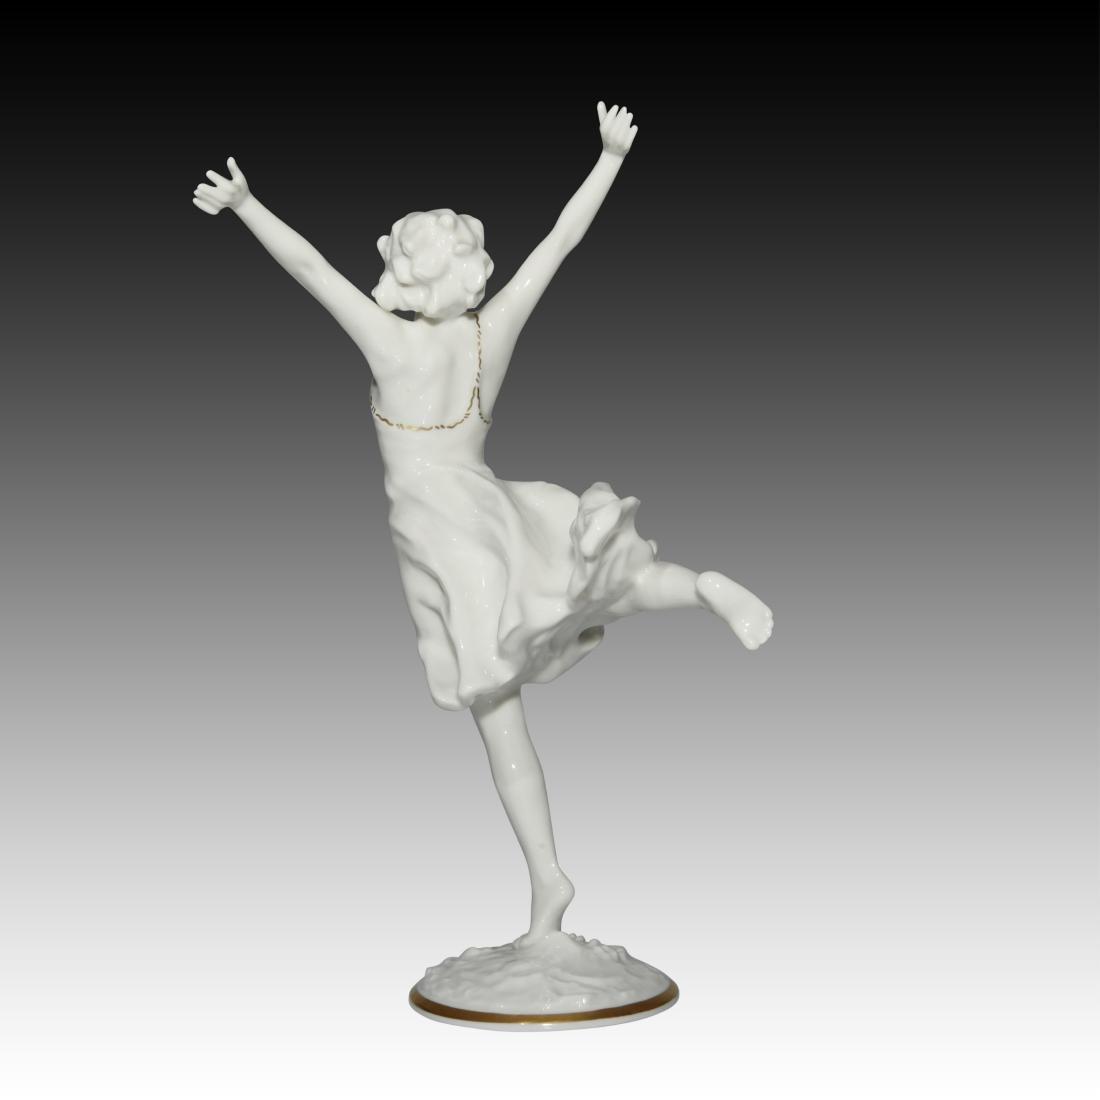 Hutschenreuther Art Deco Figurine Dancing - 3